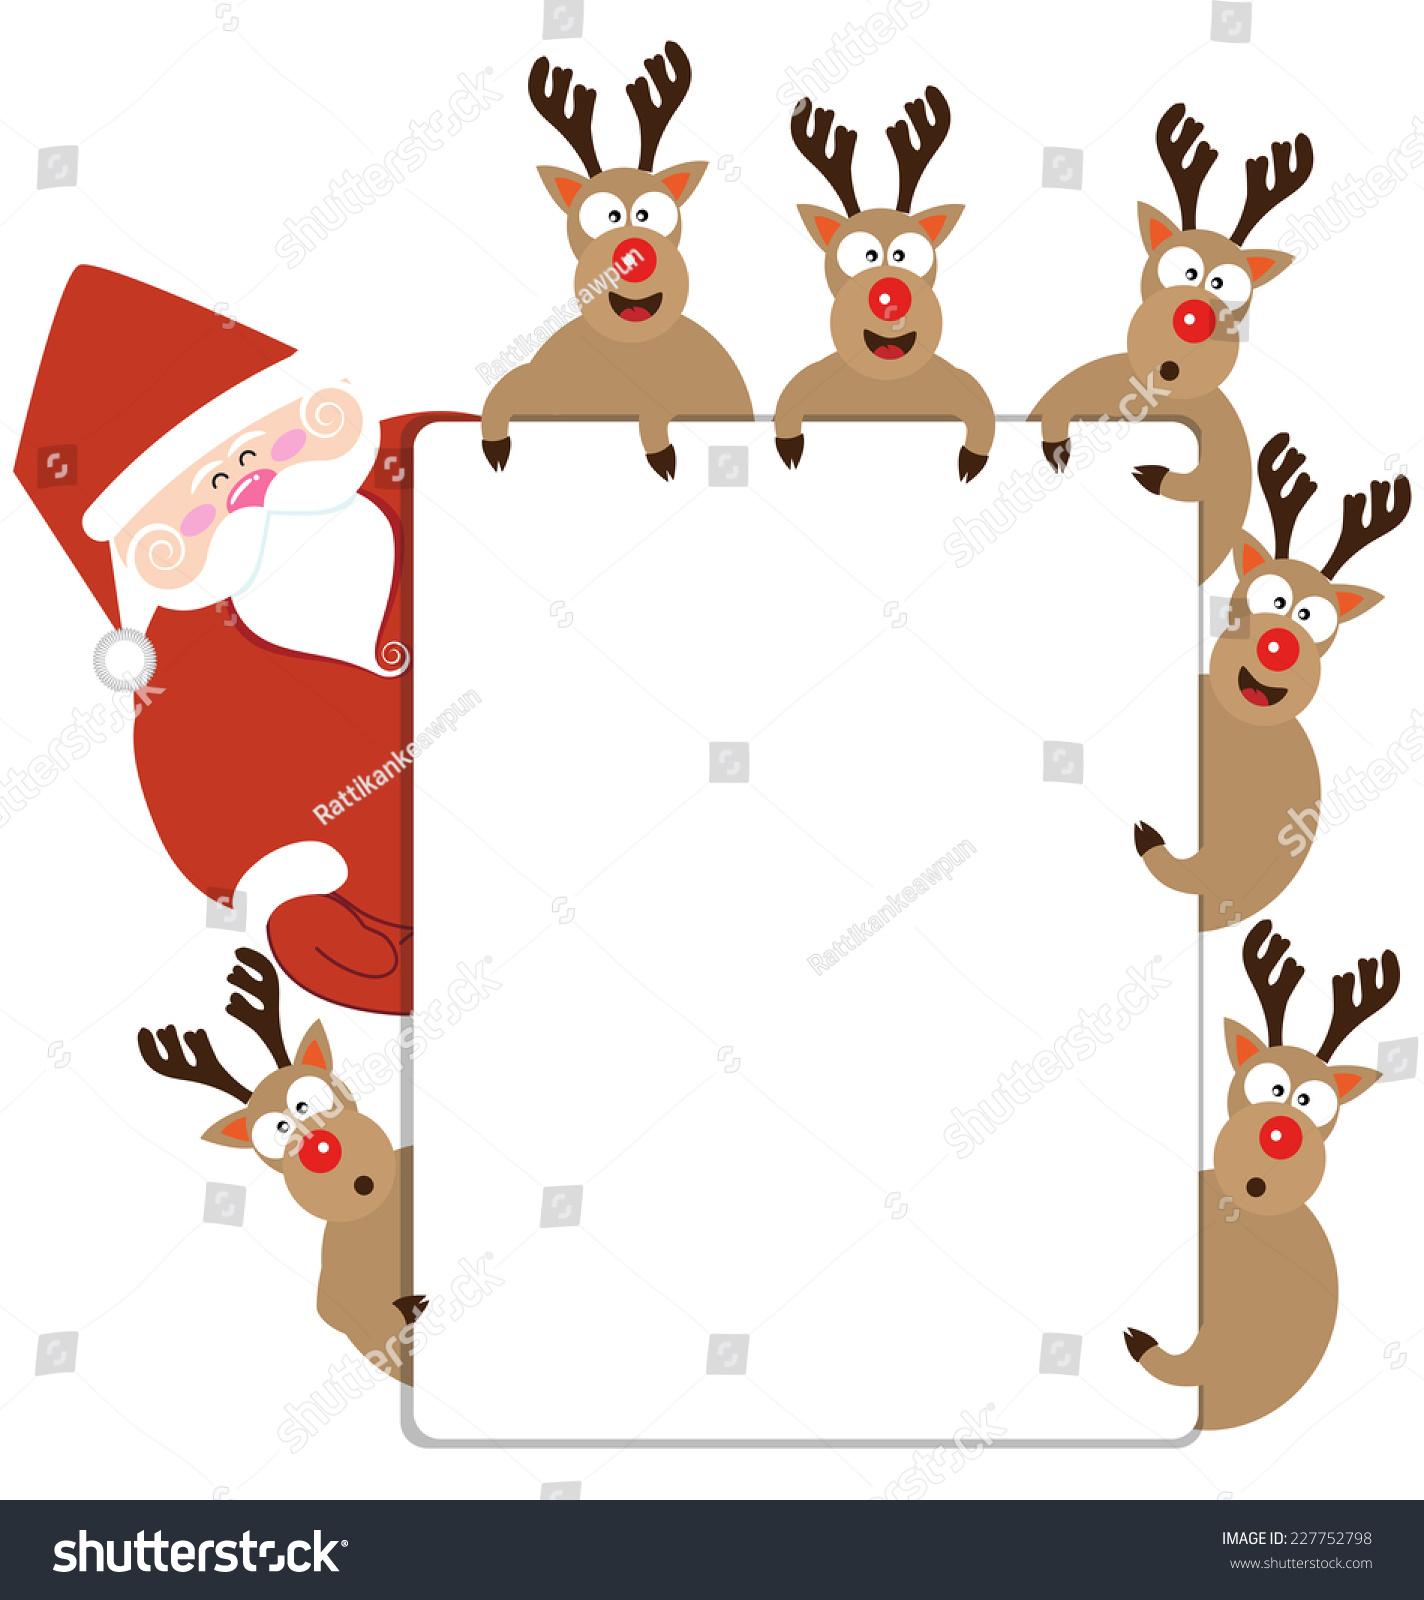 Santa Claus Reindeer Present Christmas Card Stock Vector ...